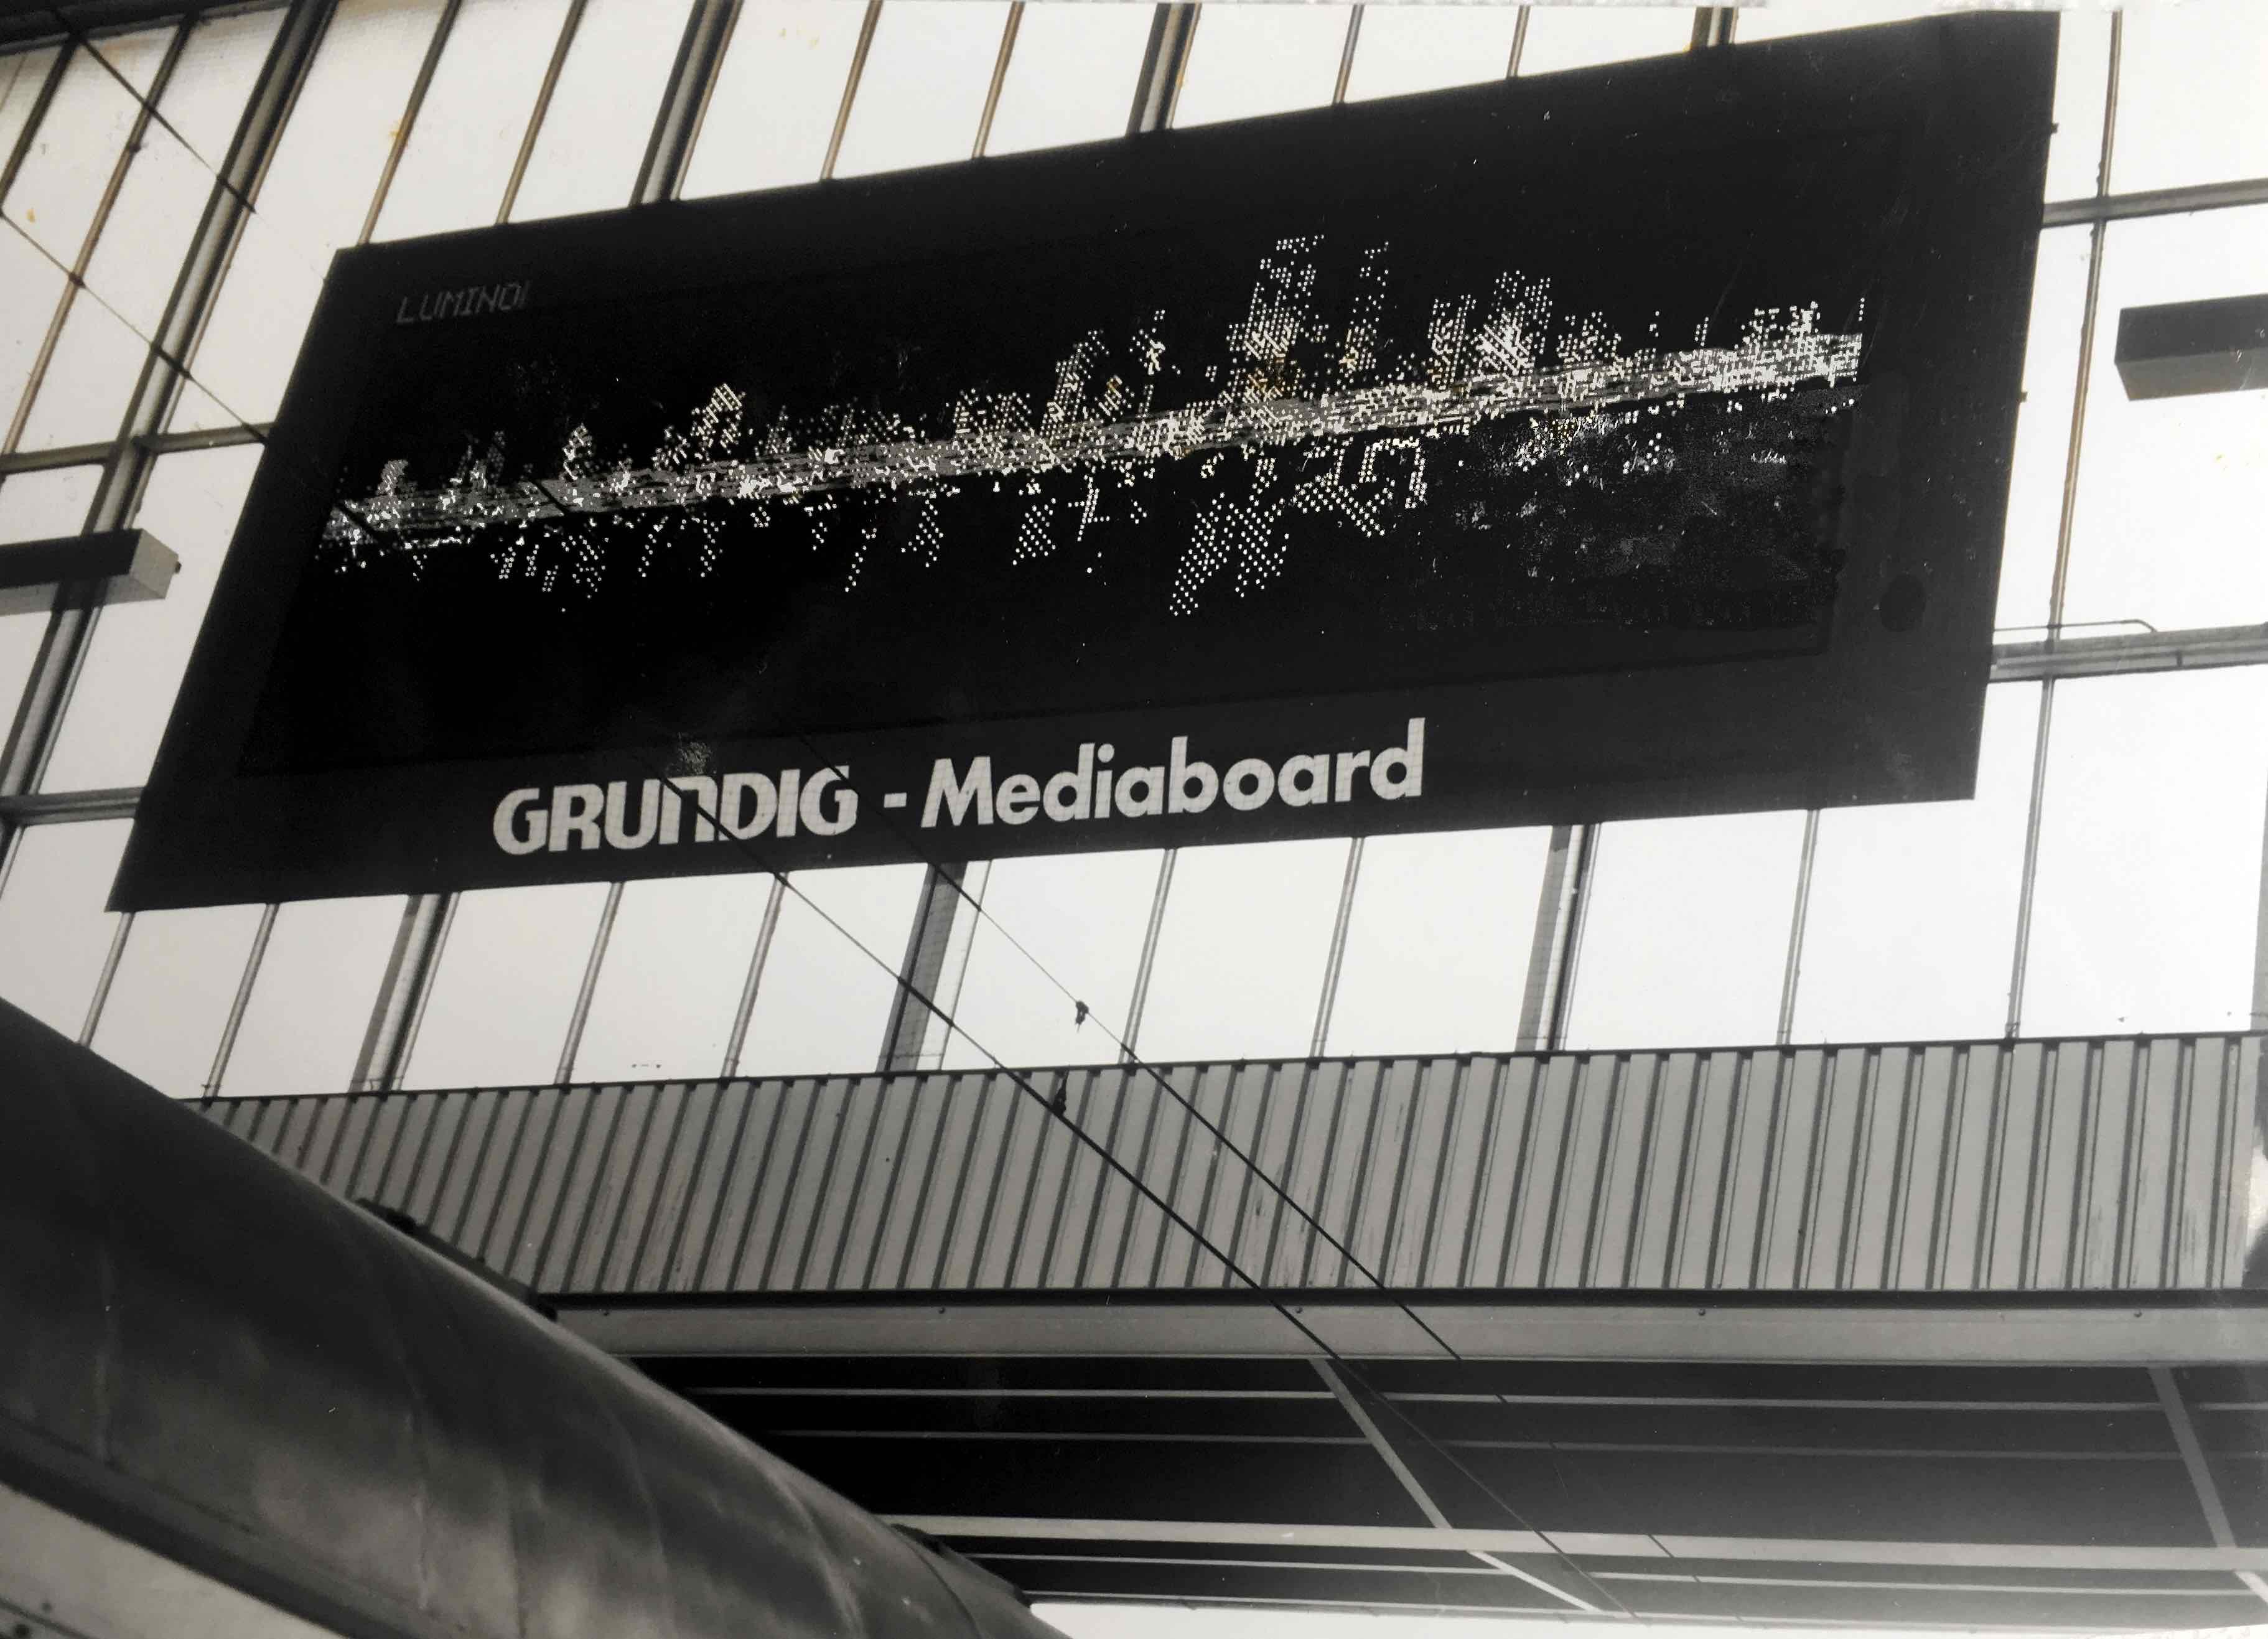 stadt am wasser, animation, led-mediaboard, münchen 1990